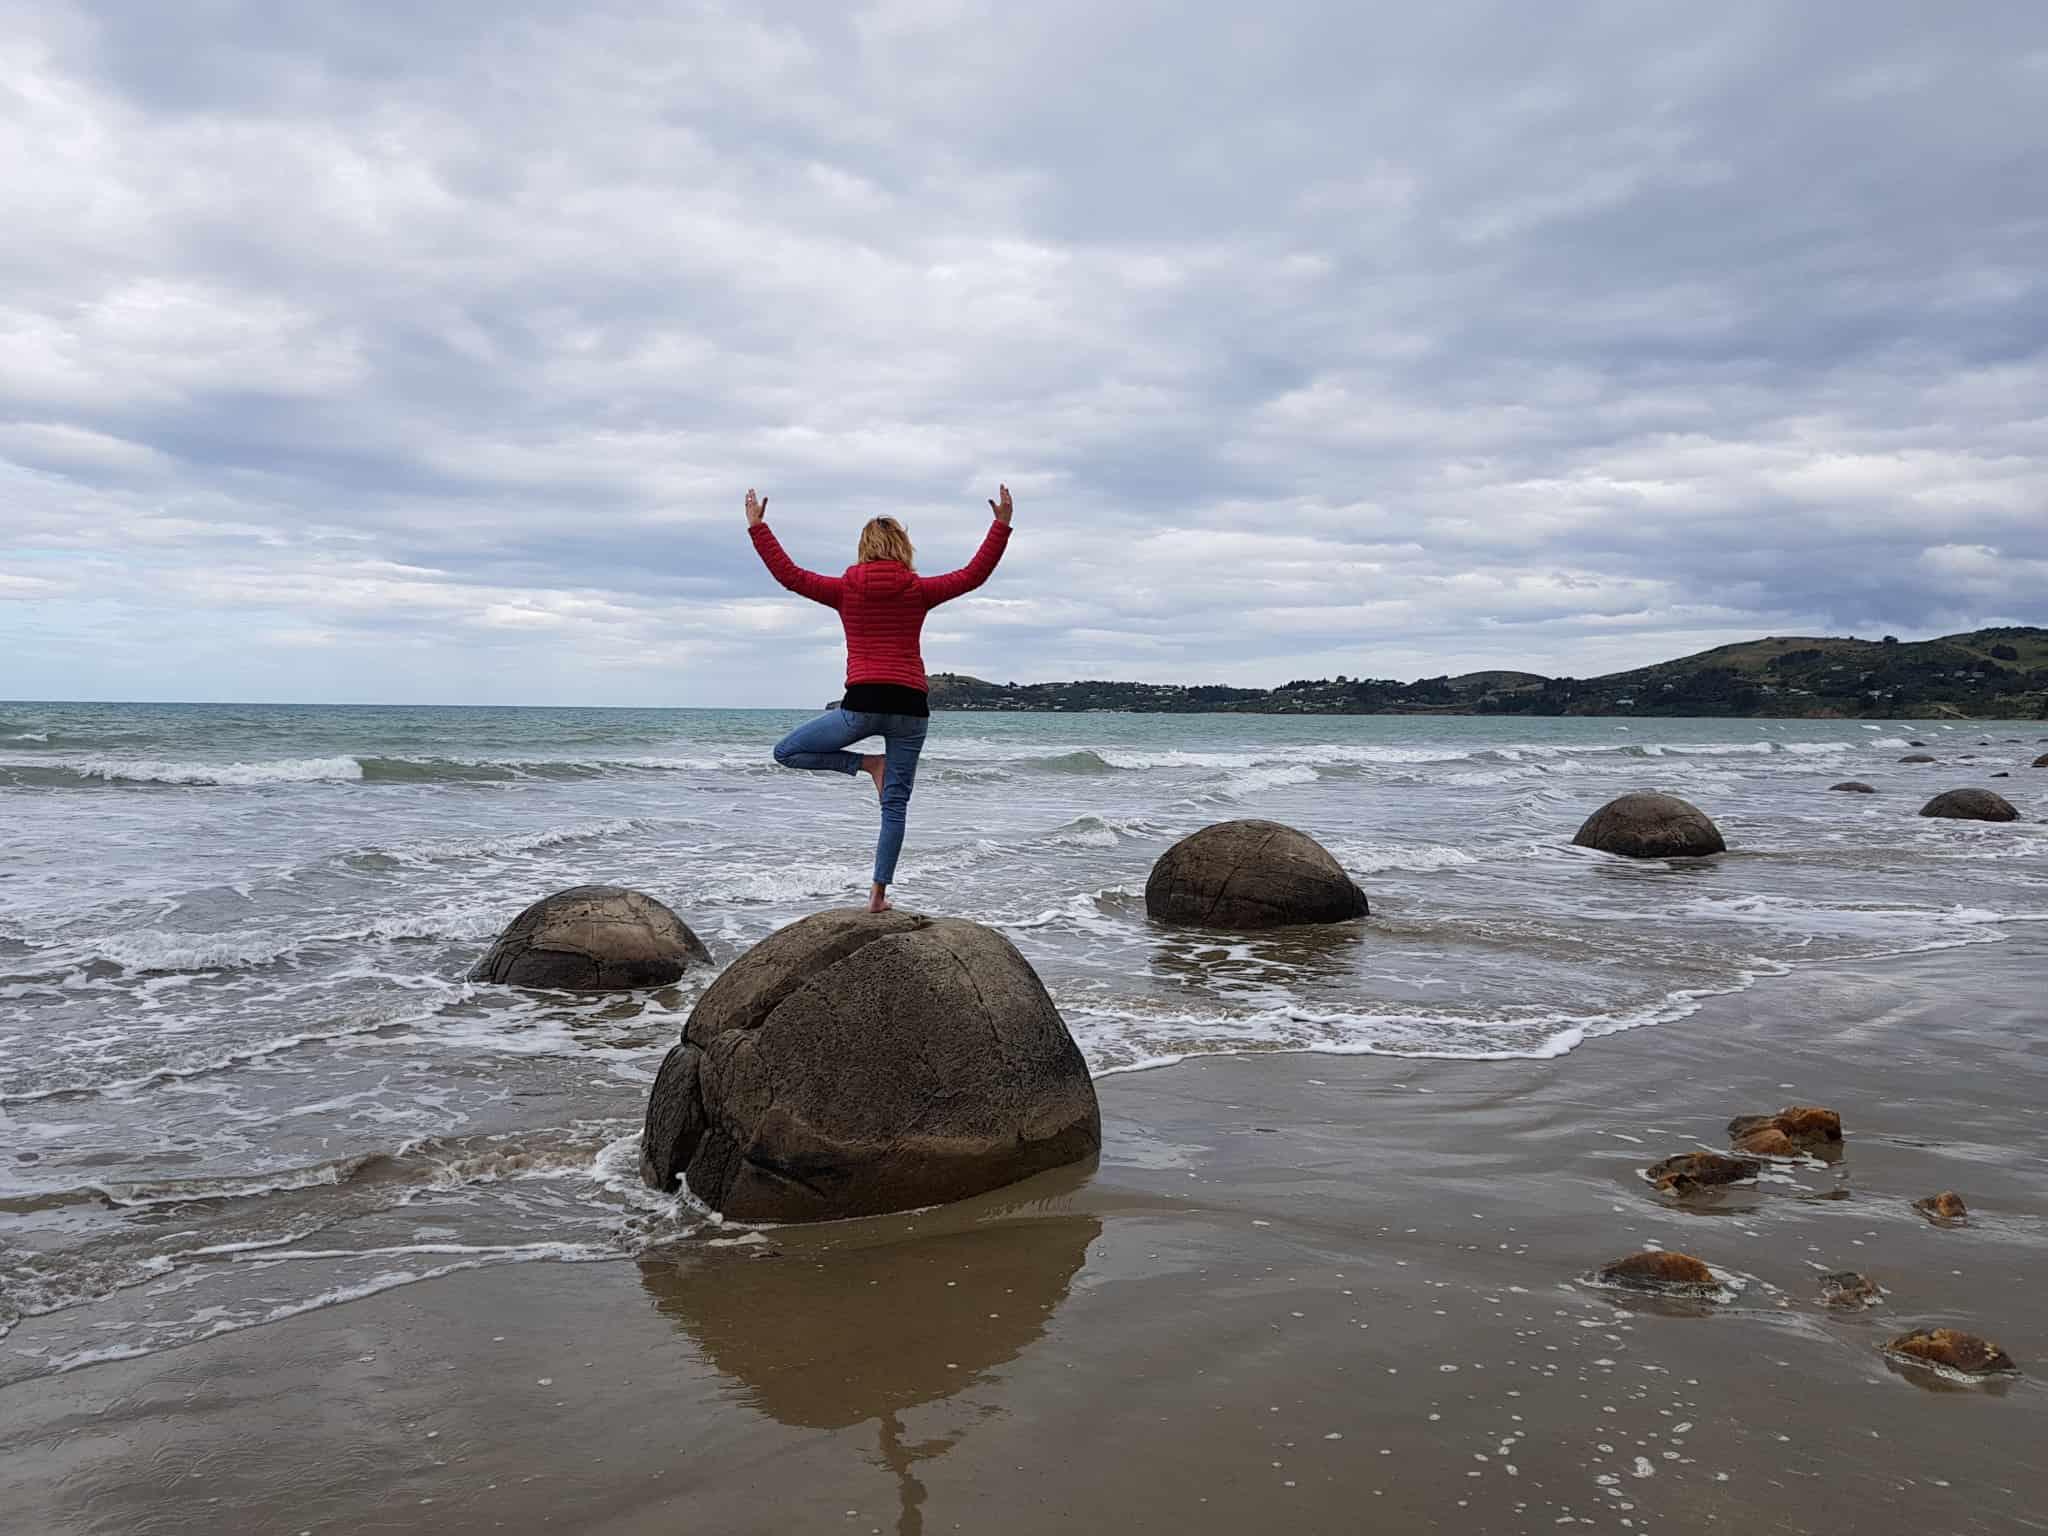 Moeraki Boulders, nouvelle-zélande